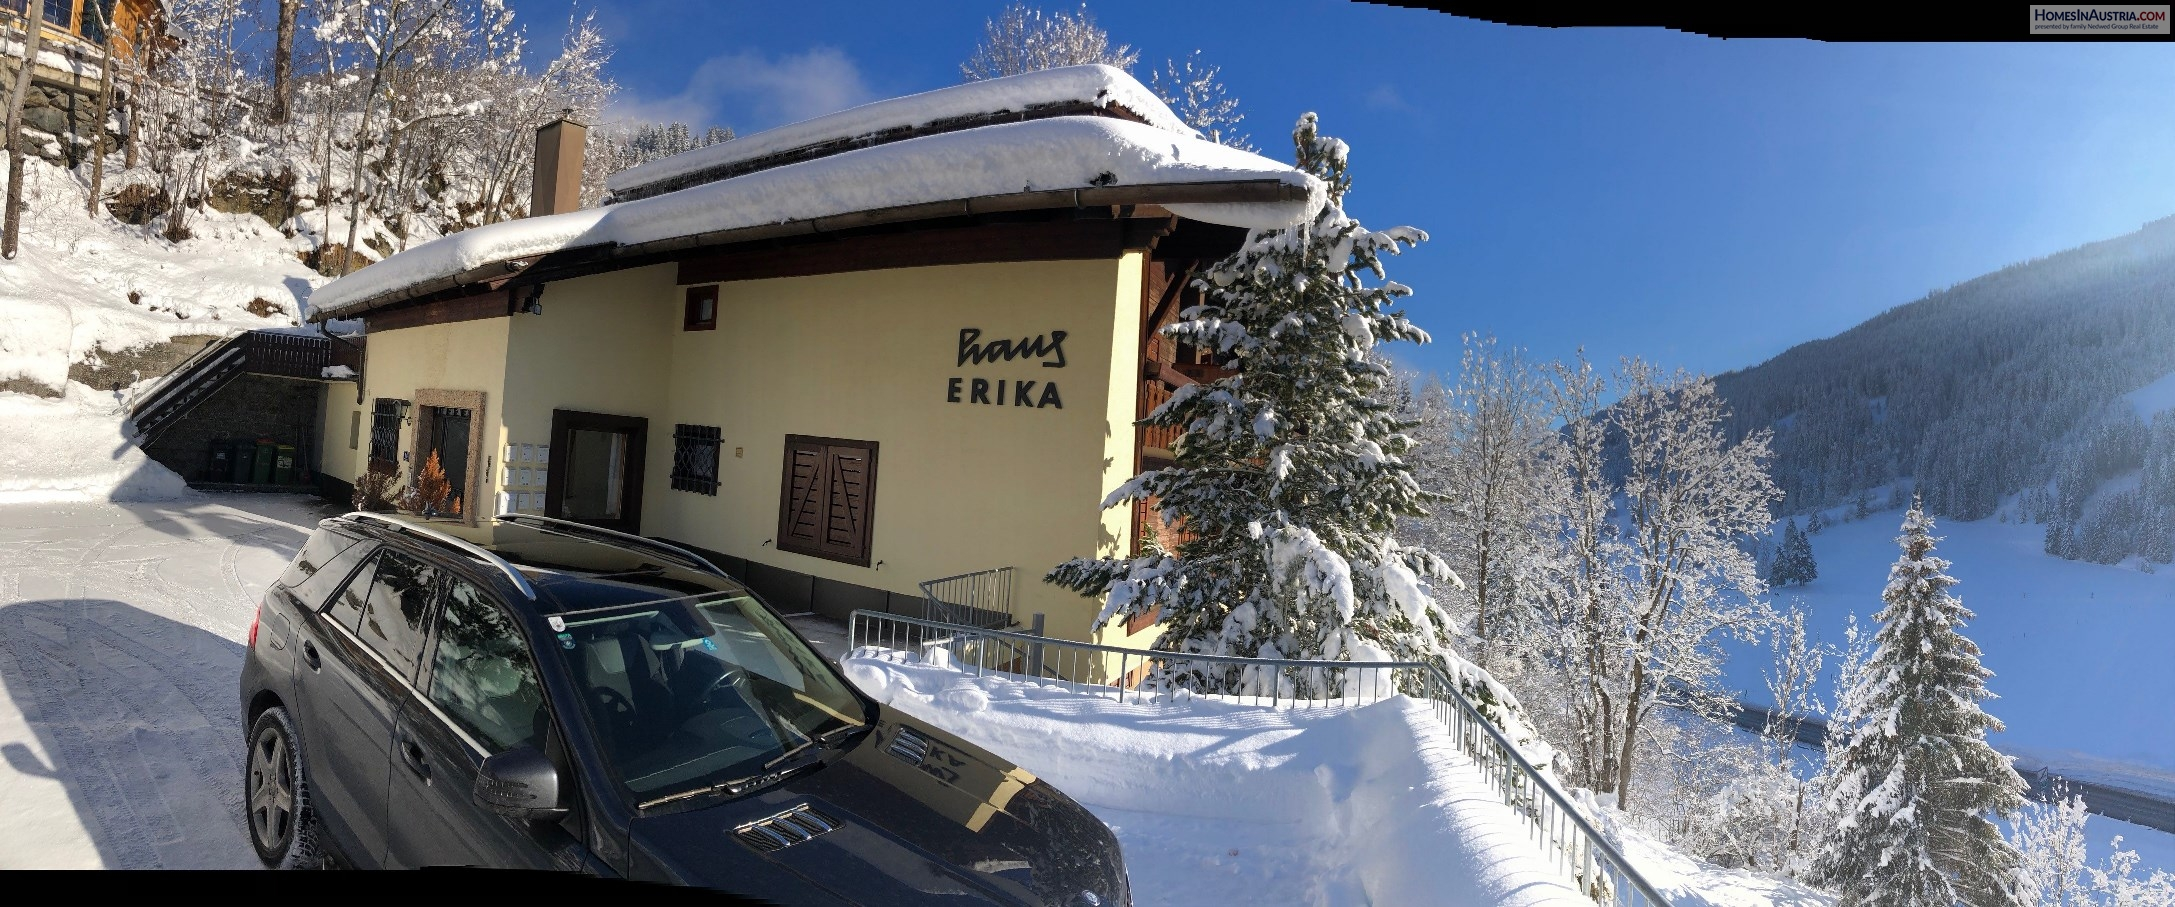 Bad Kleinkirchheim, Carinthia, Beautiful 2 Bedrooms, 2 Baths Apartment (ERIKA Top9), Balcony, Parking